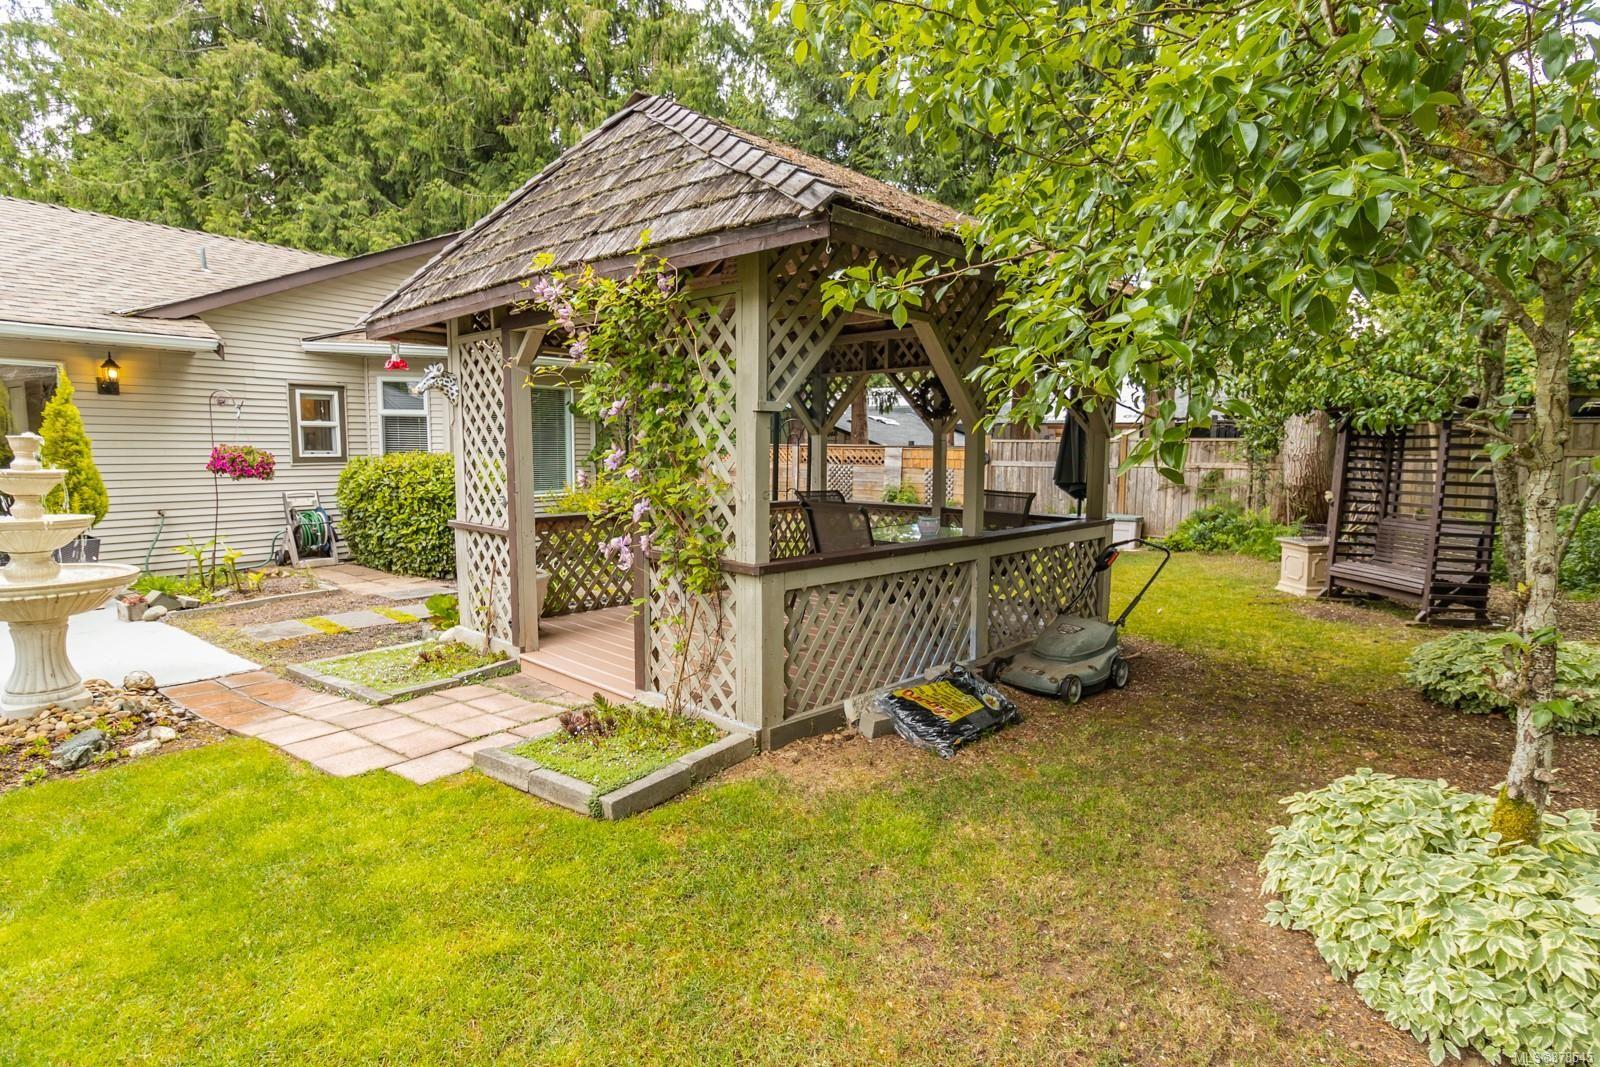 Photo 28: Photos: 1070 Symons Cres in : PQ Qualicum Beach House for sale (Parksville/Qualicum)  : MLS®# 878545